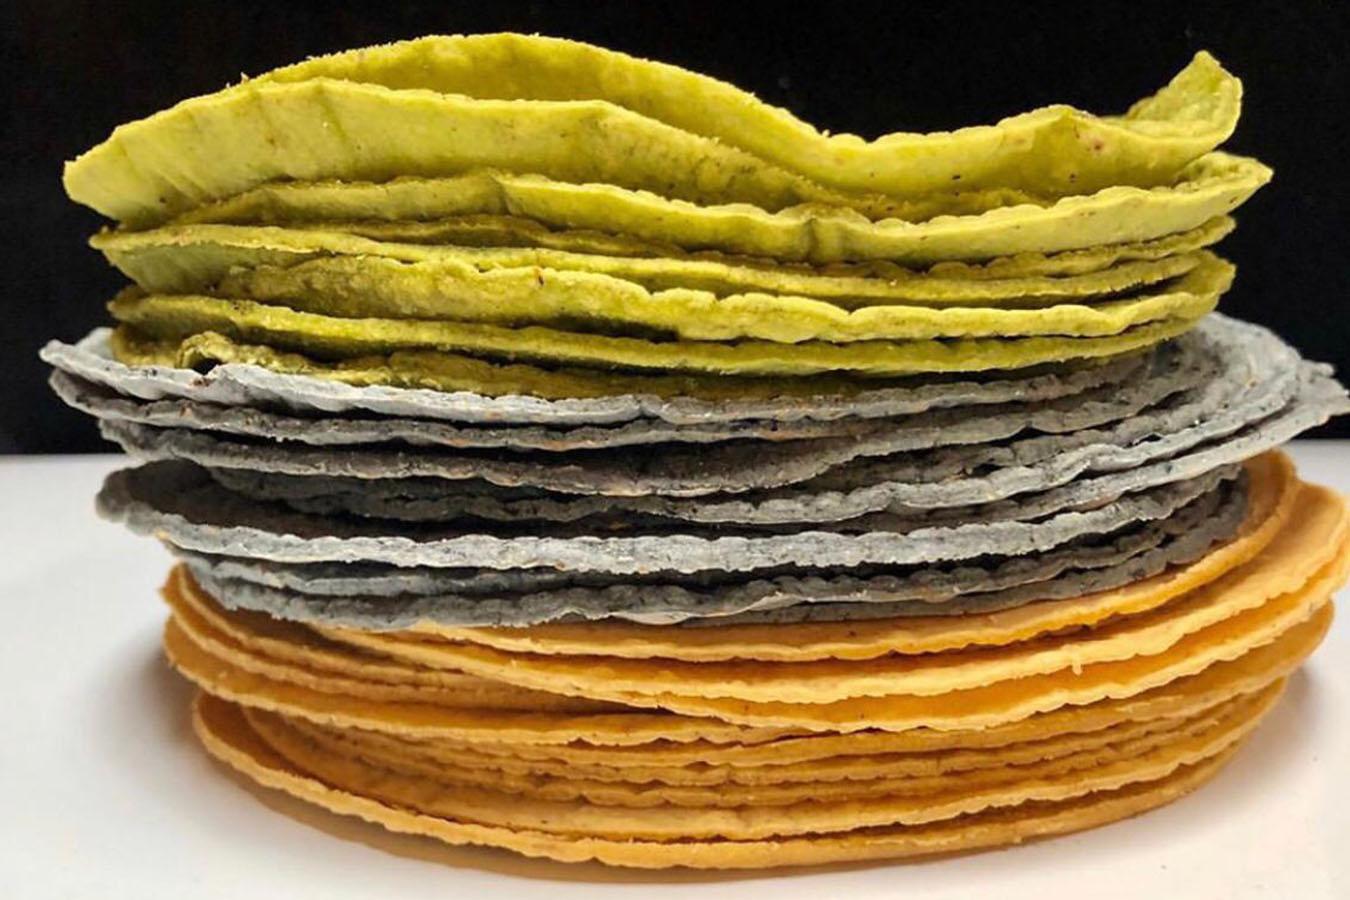 tortillas de maiz nixtamalizacion tortillas artesanales san cristobal de las casas batsi waj